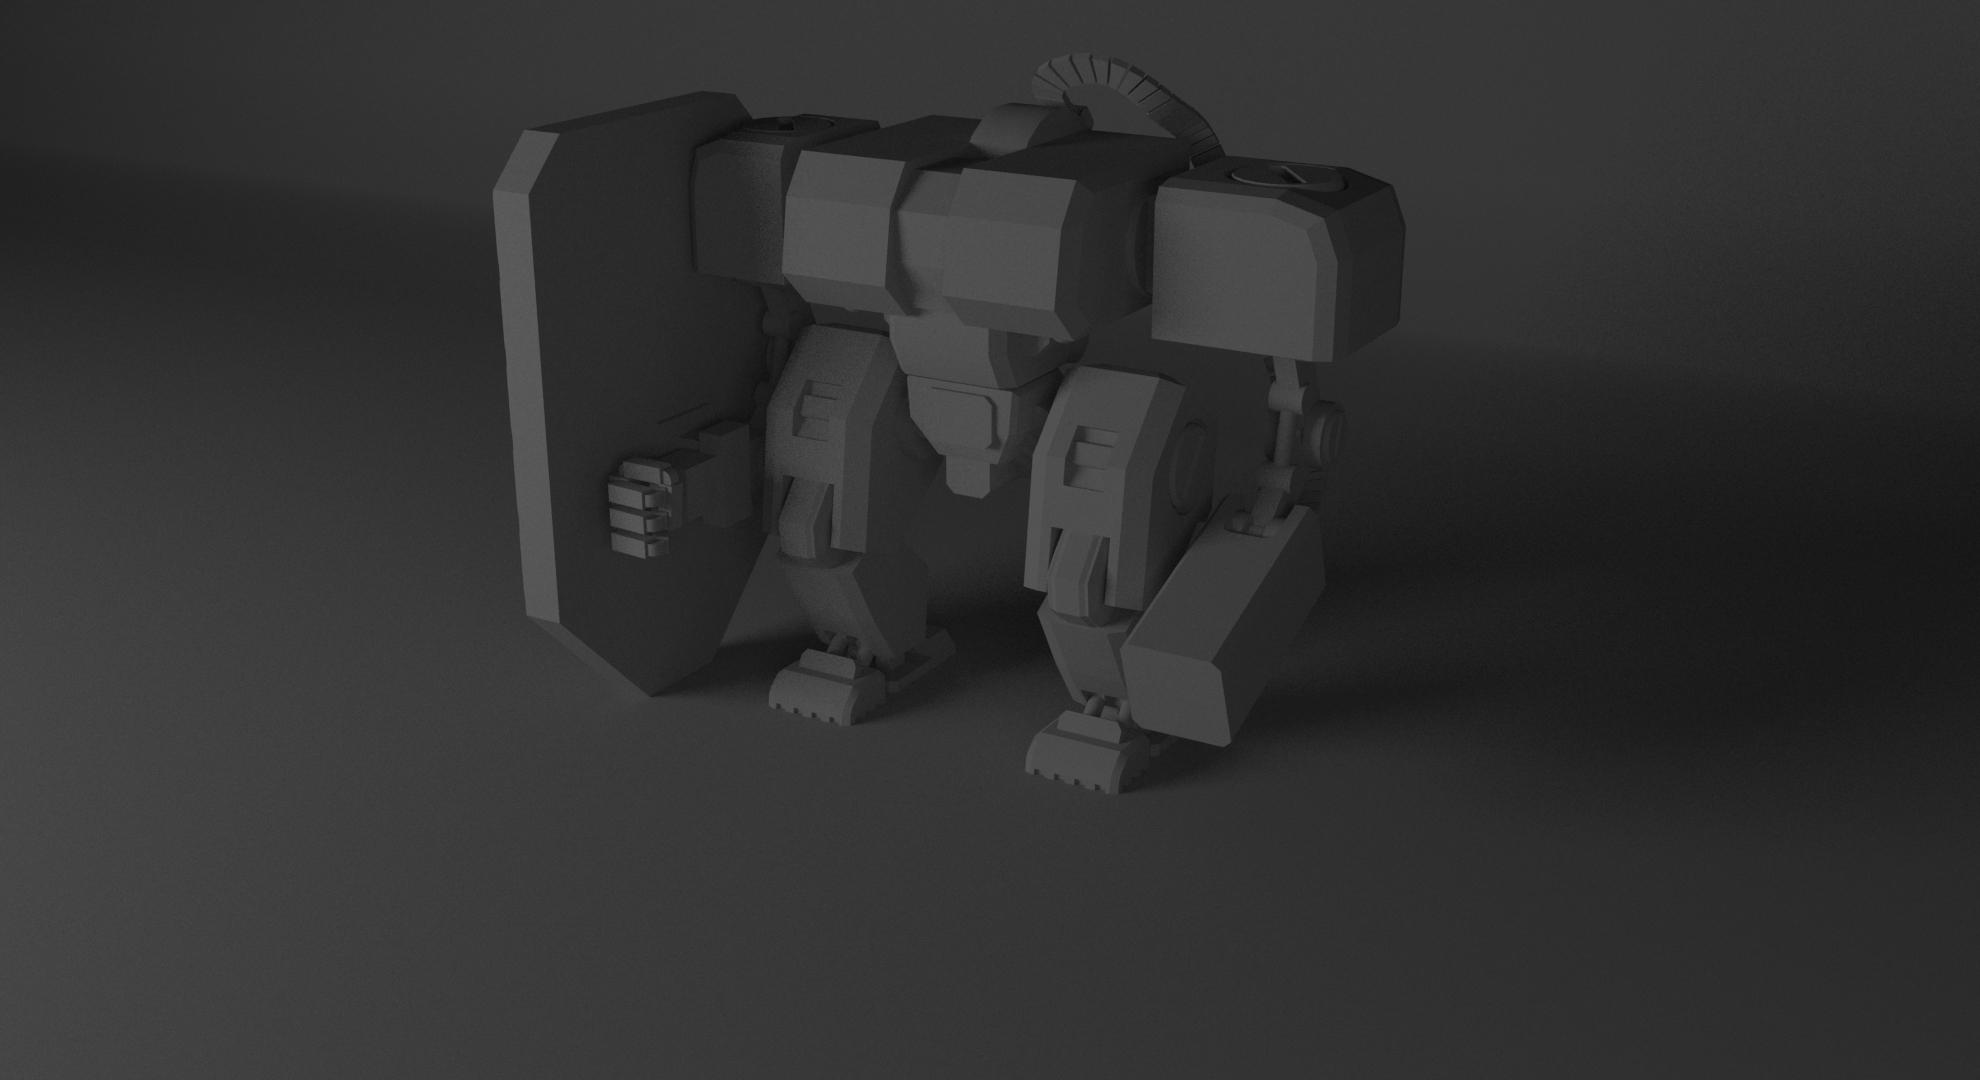 Centurion_2.jpg